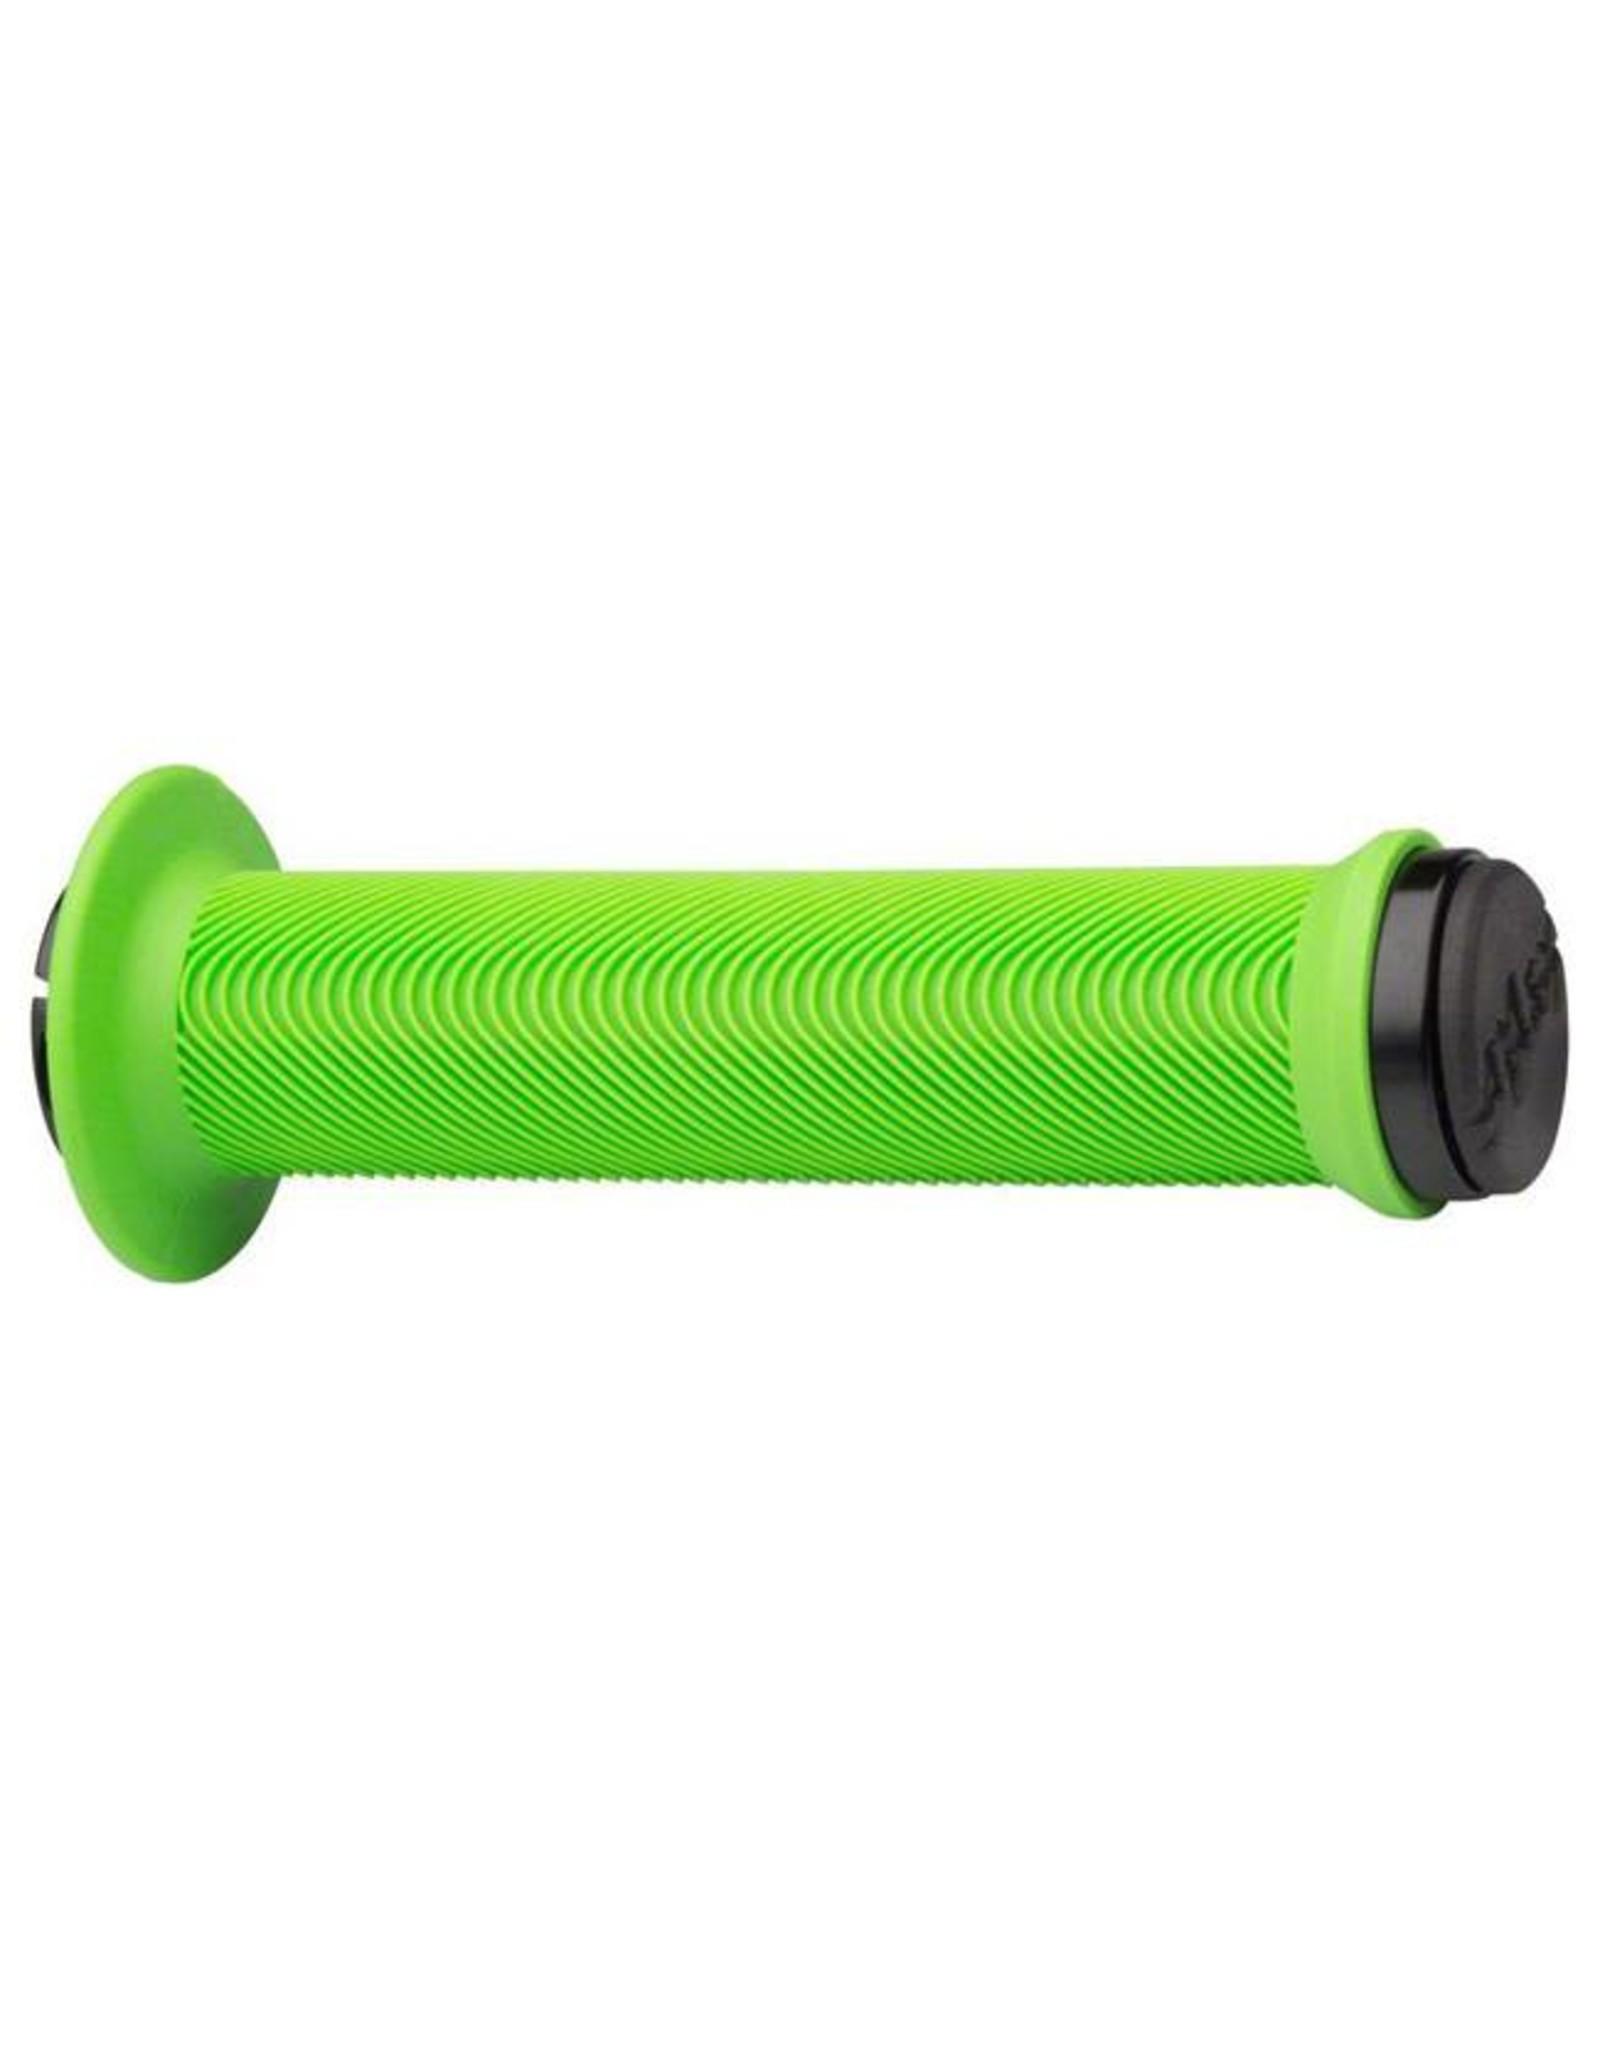 ODI ODI Sensus Swayze Lock-On Grips Lime Green